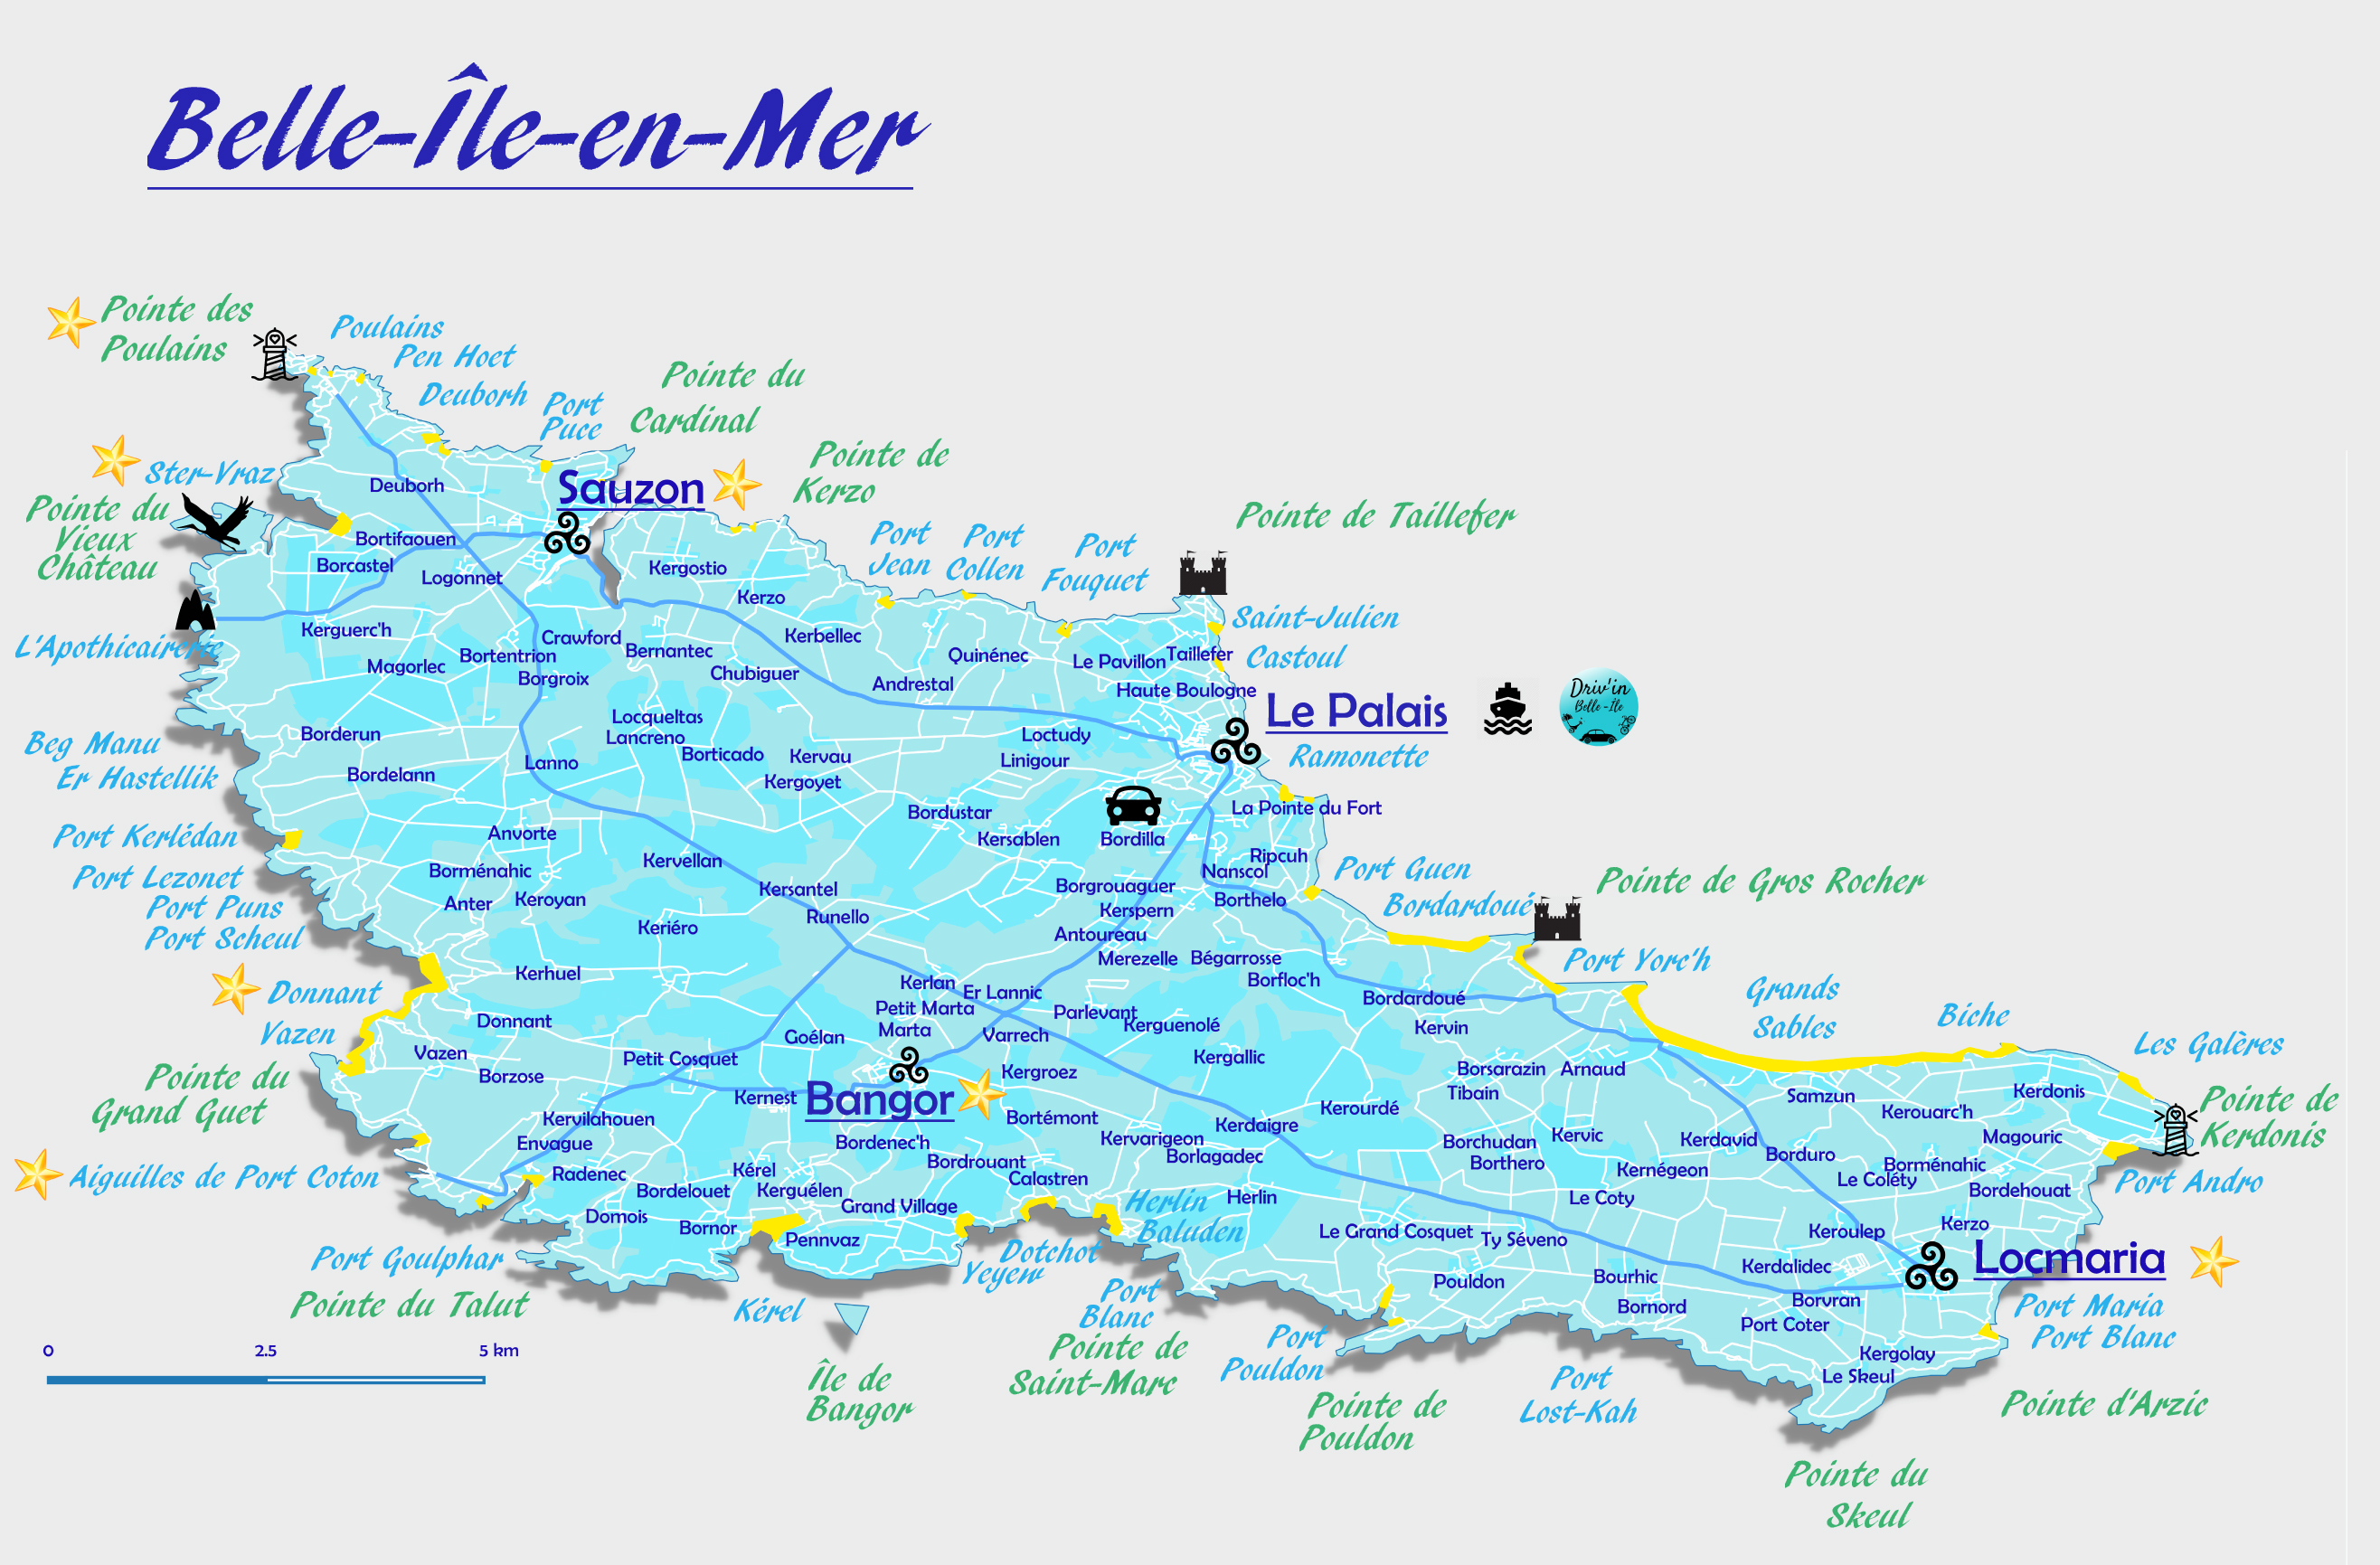 Carte Belle Ile en Mer - Découvrir Belle-Ile